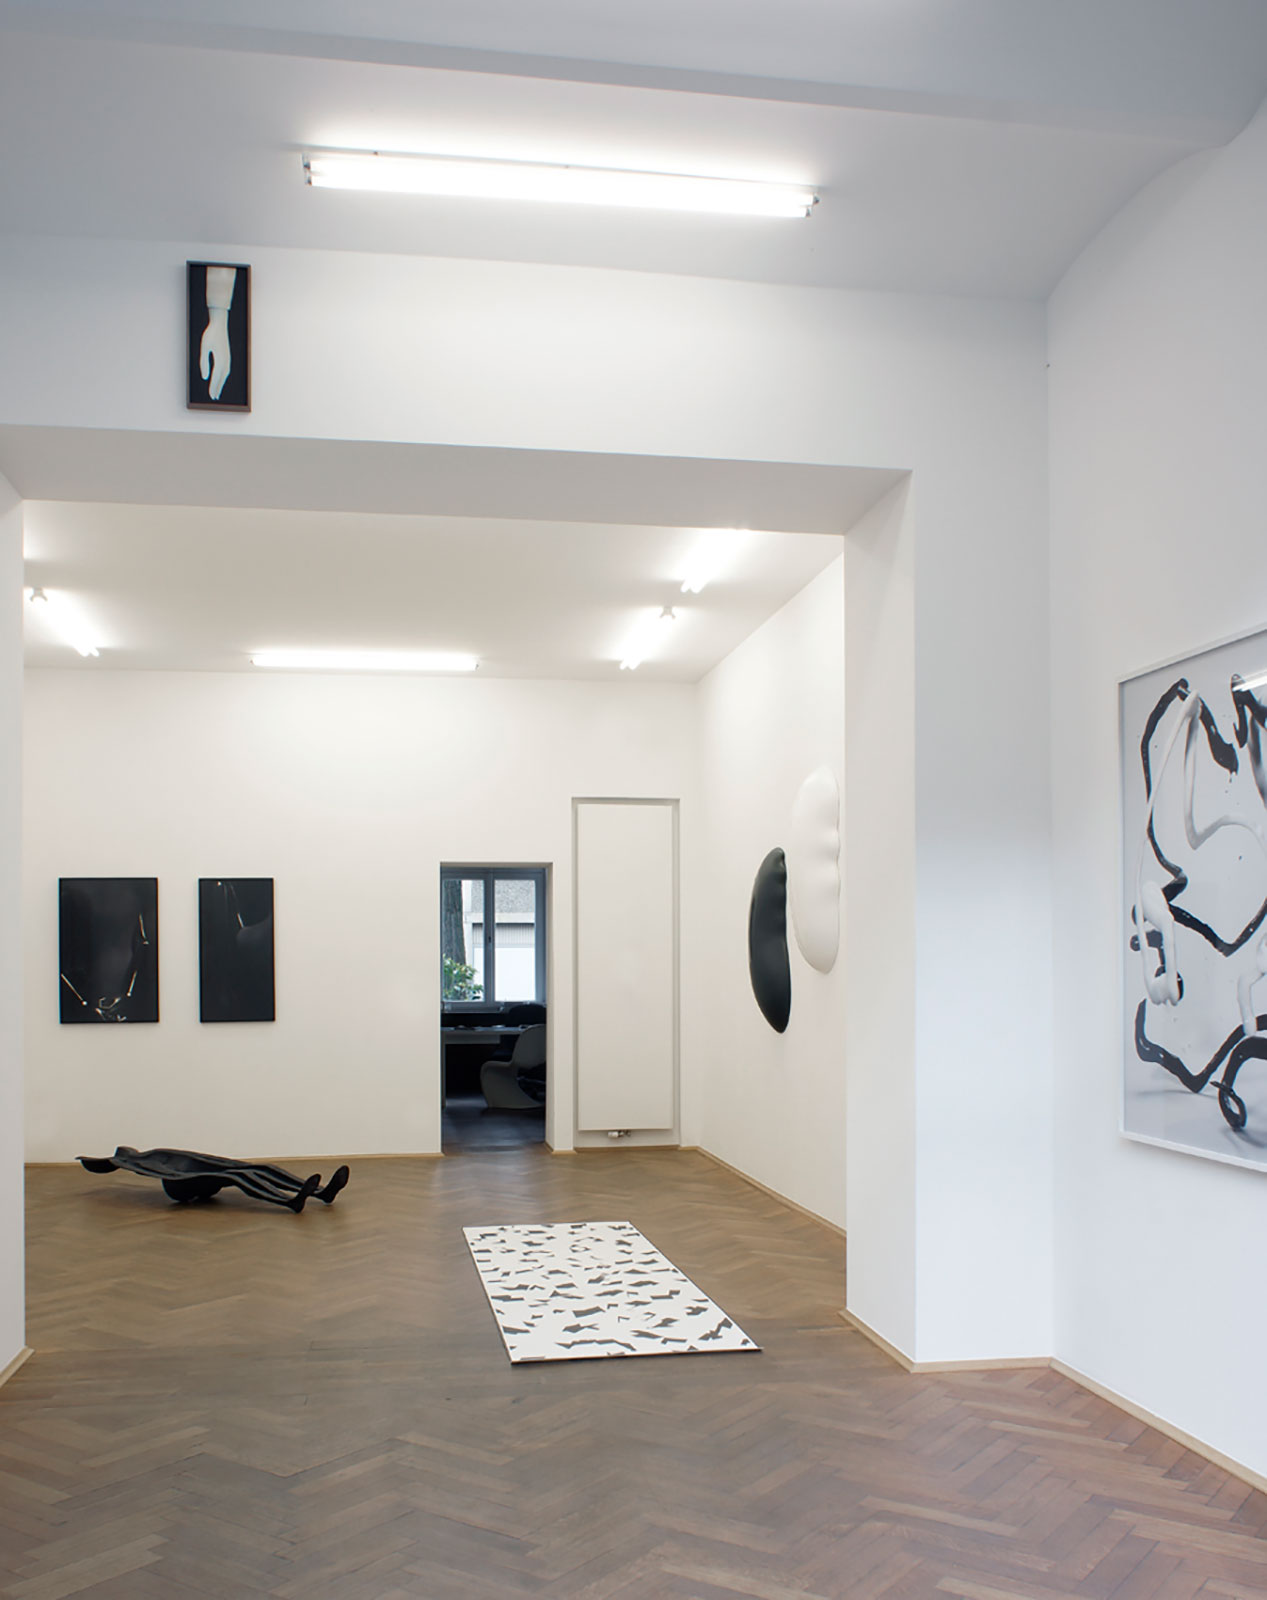 Courtesy: Kunst & Denker Contemporary, SAD BOT TRUE, Banz & Bowinkel, Louisa Clement, Felicitas Rohden